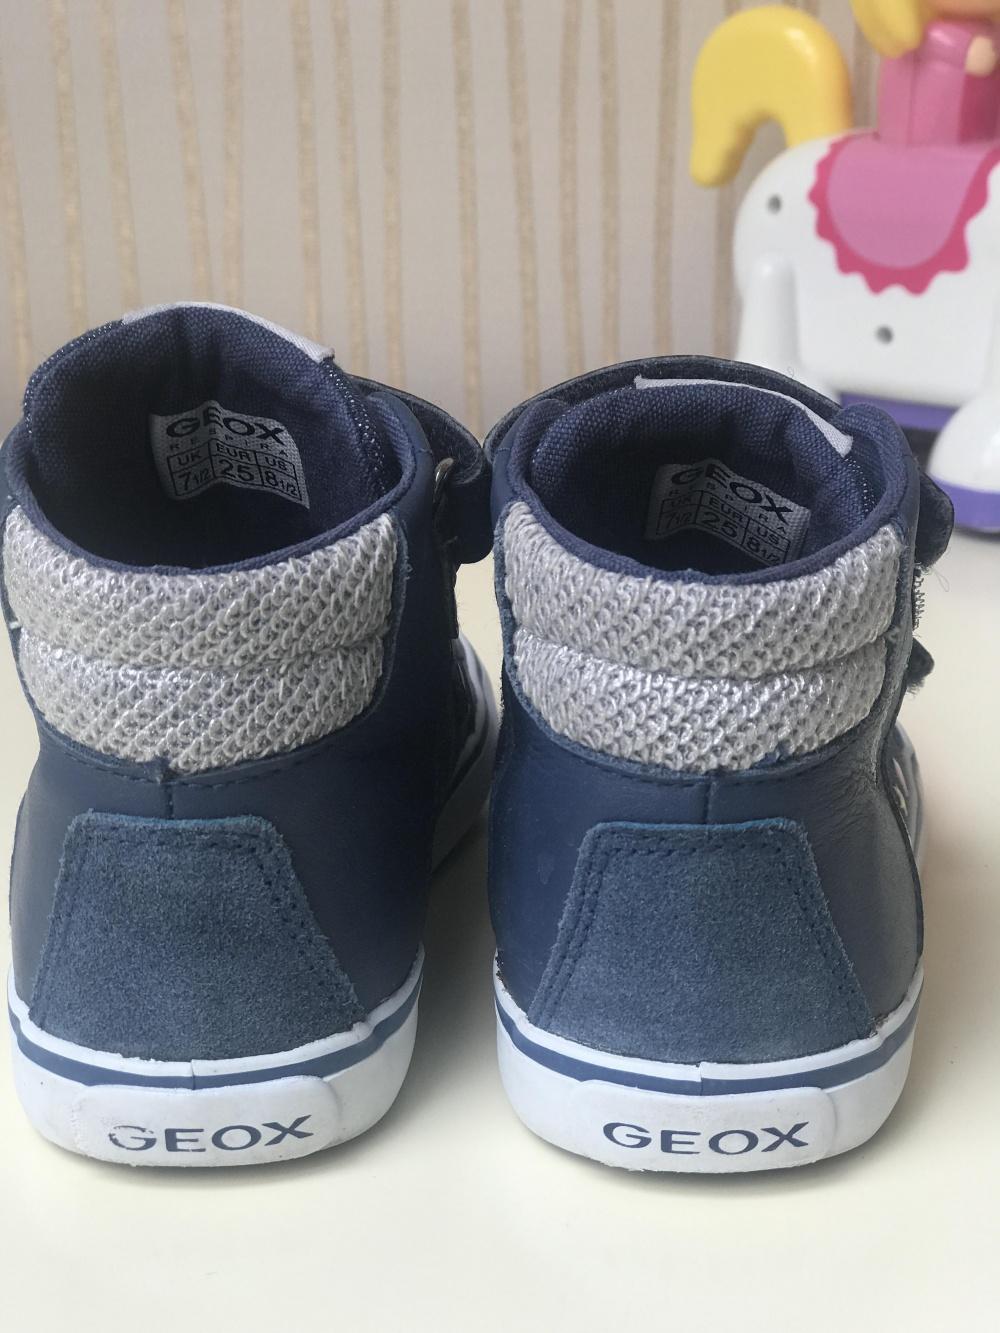 Кеды д/девочки Geox, 25 размер